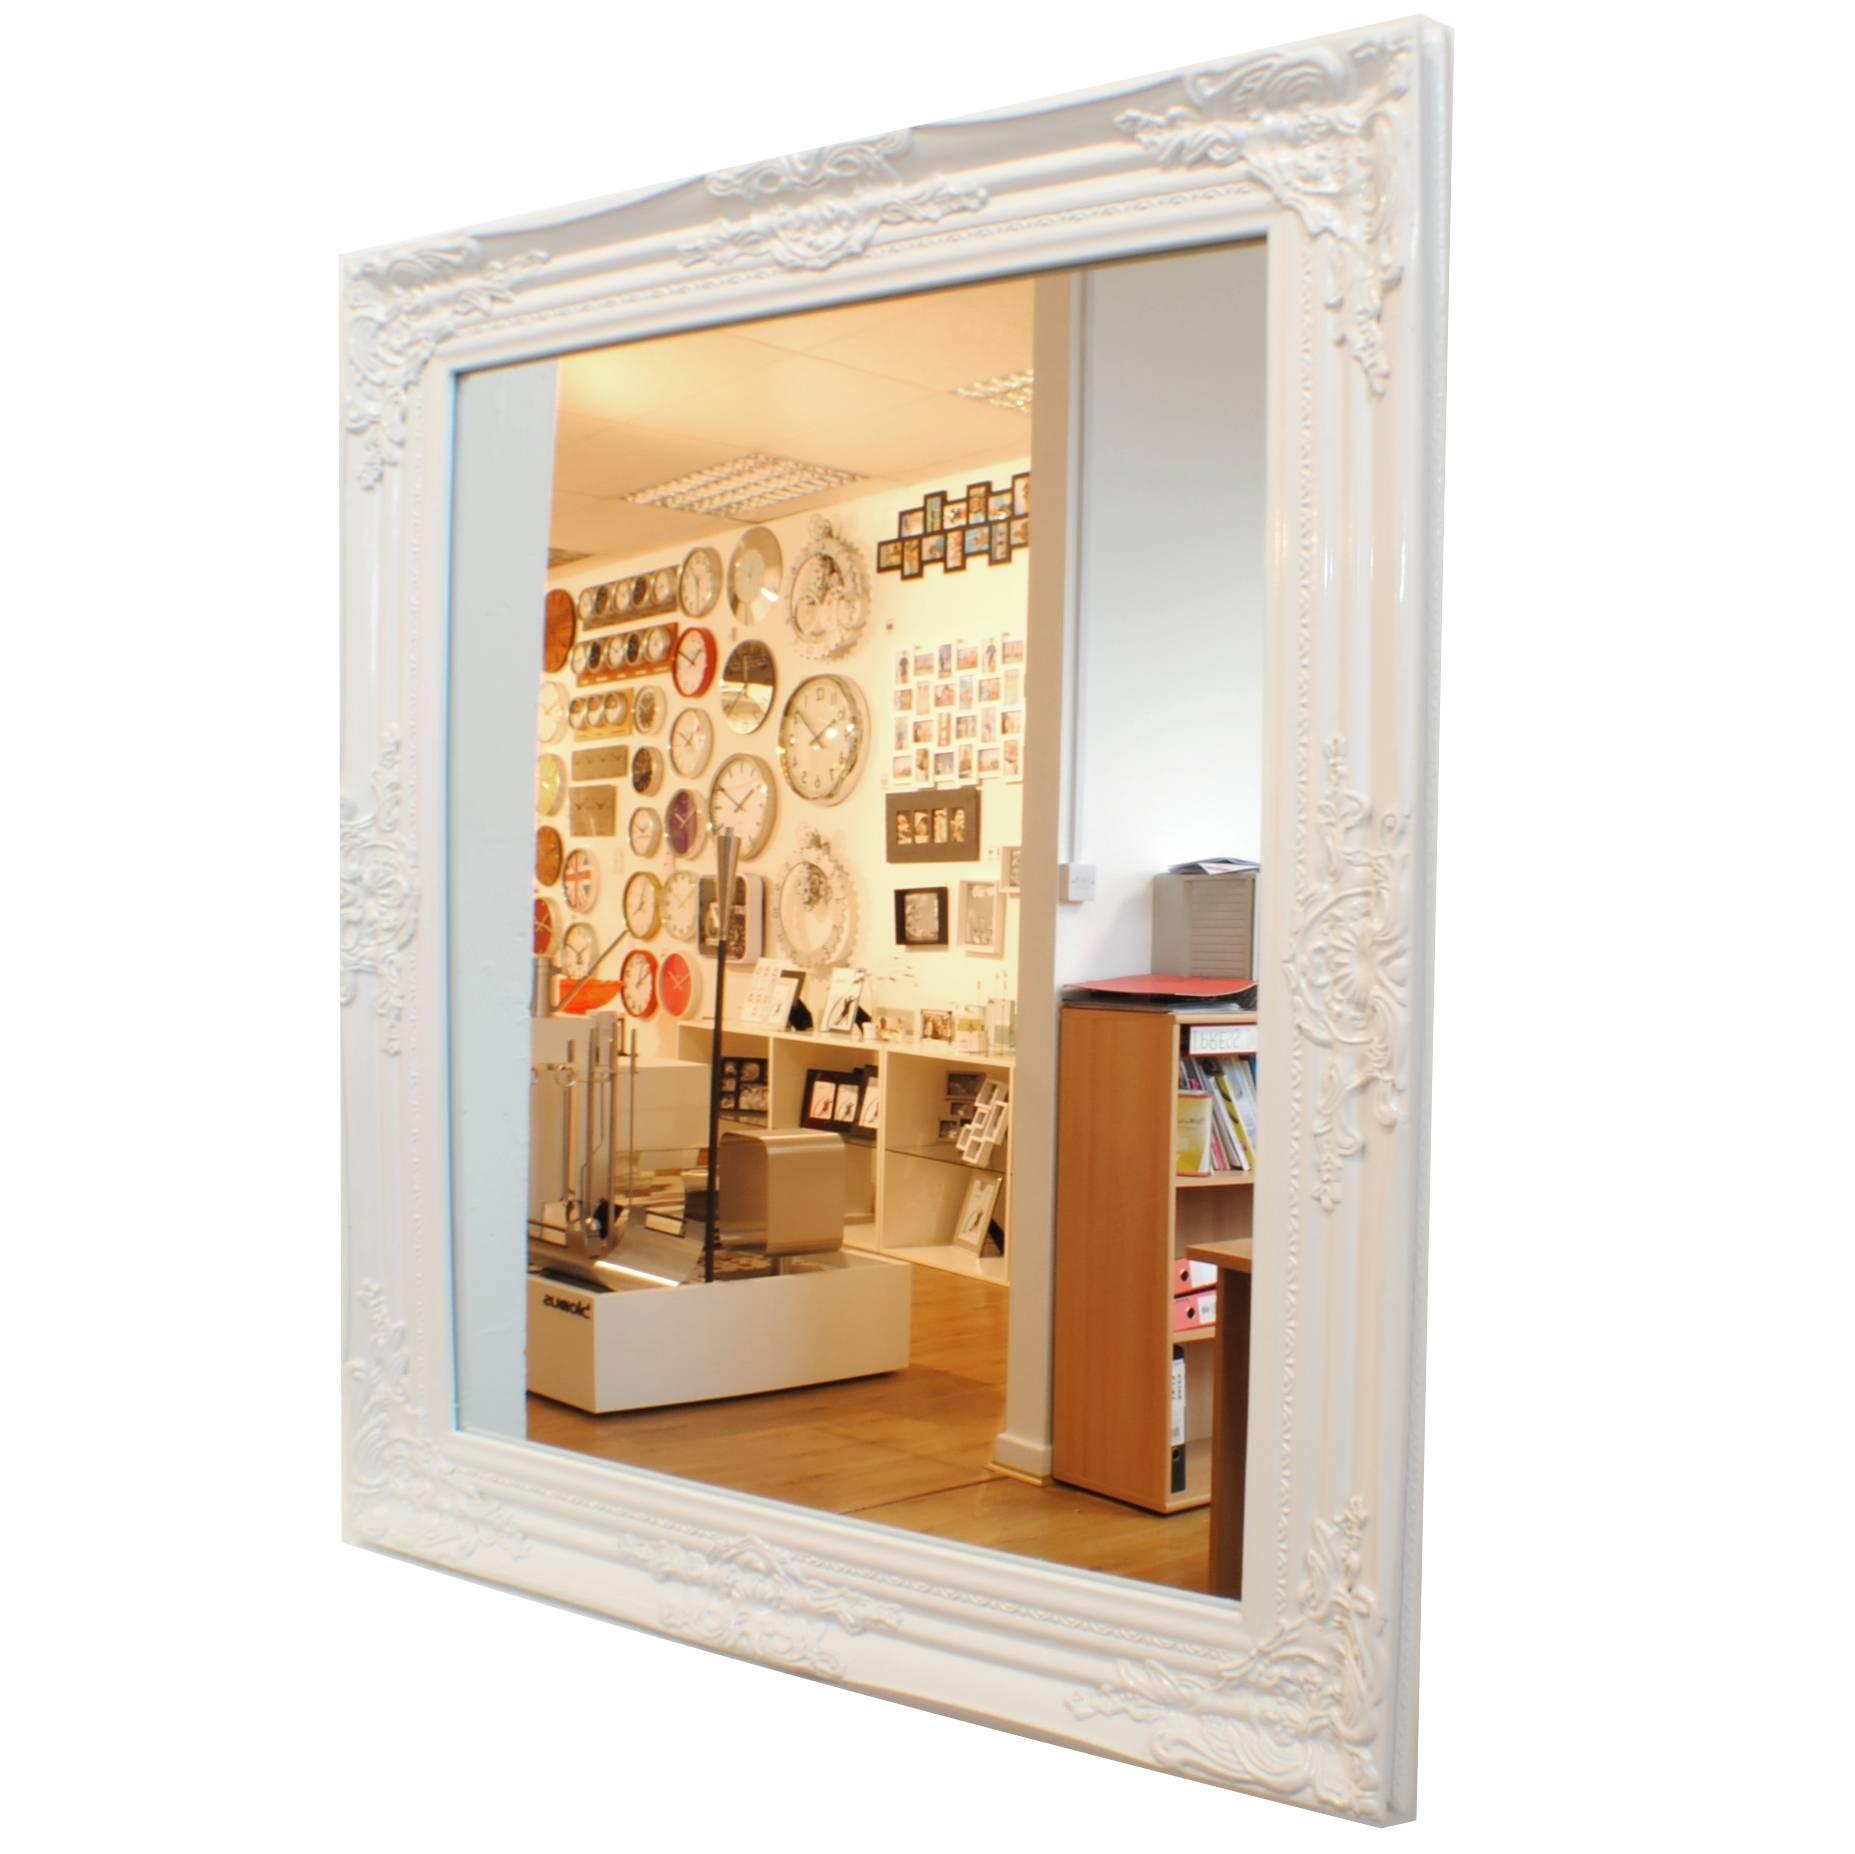 Classic Baroque Vintage Gloss White Wall Mirror Uk with White Baroque Wall Mirrors (Image 11 of 25)